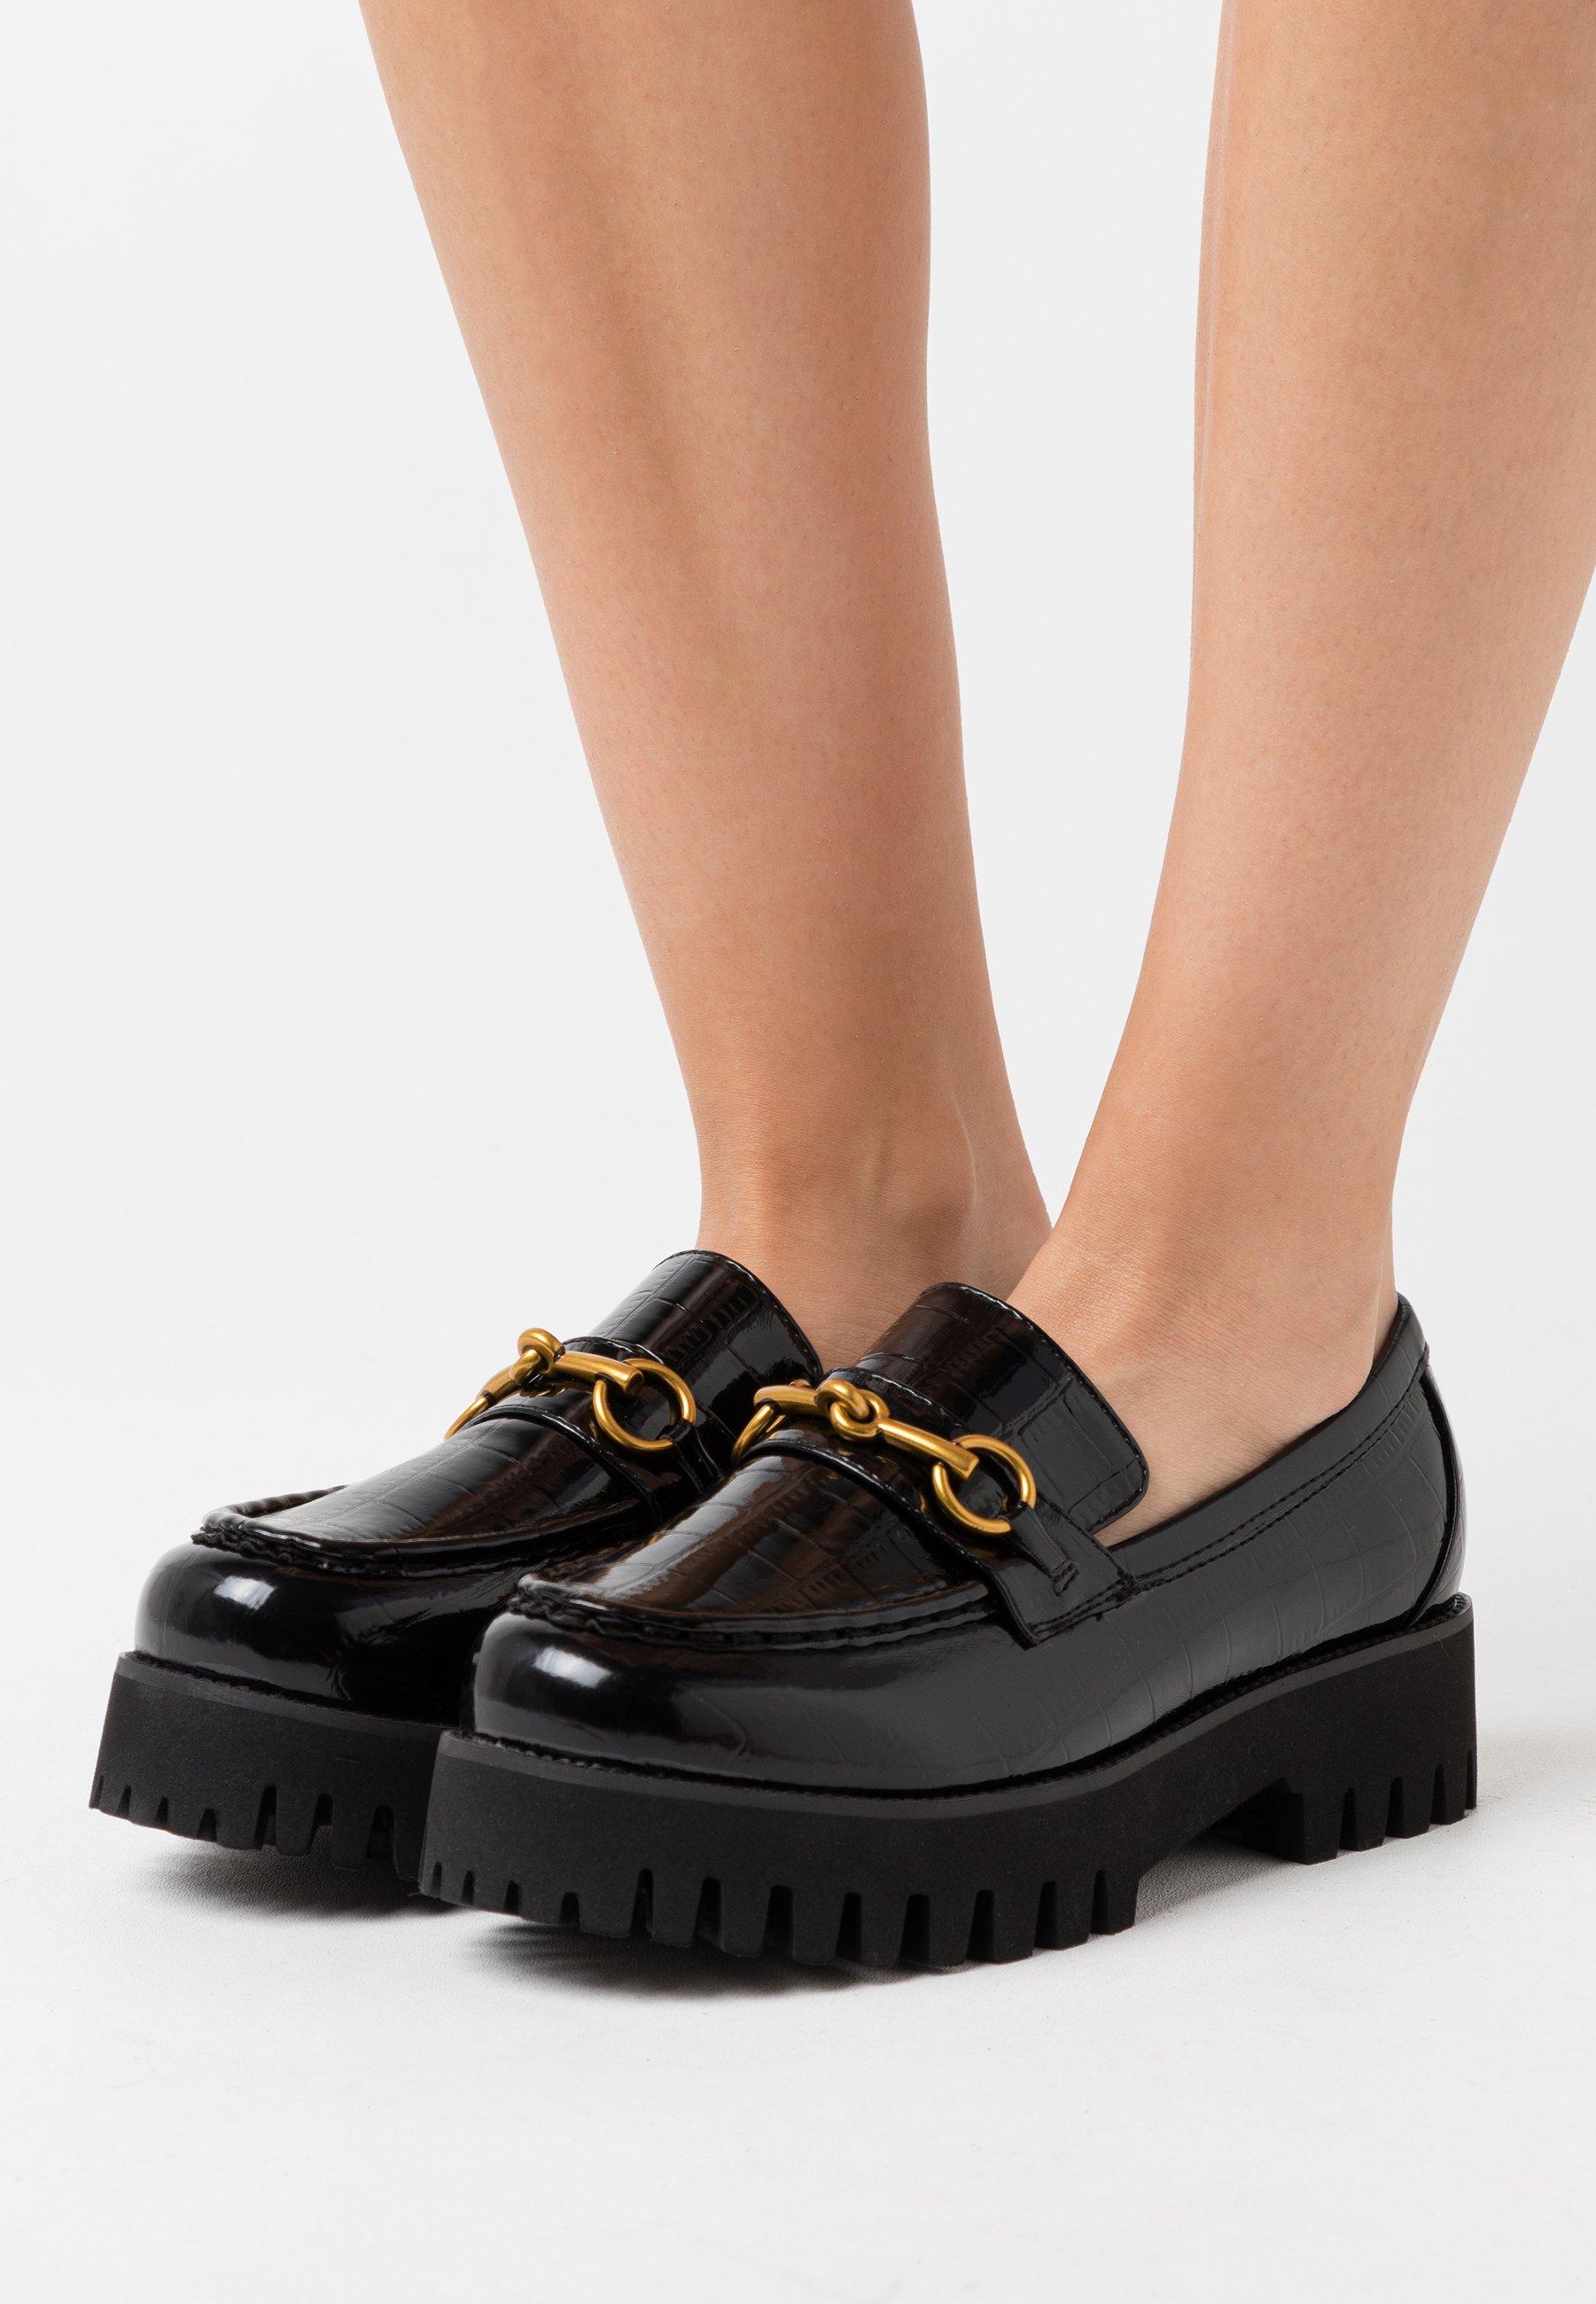 Factory Price Nice Women's Shoes RAID Wide Fit WIDE FIT EMPIRE Slip-ons black NZdaFsDQz IDVMzkFJ6